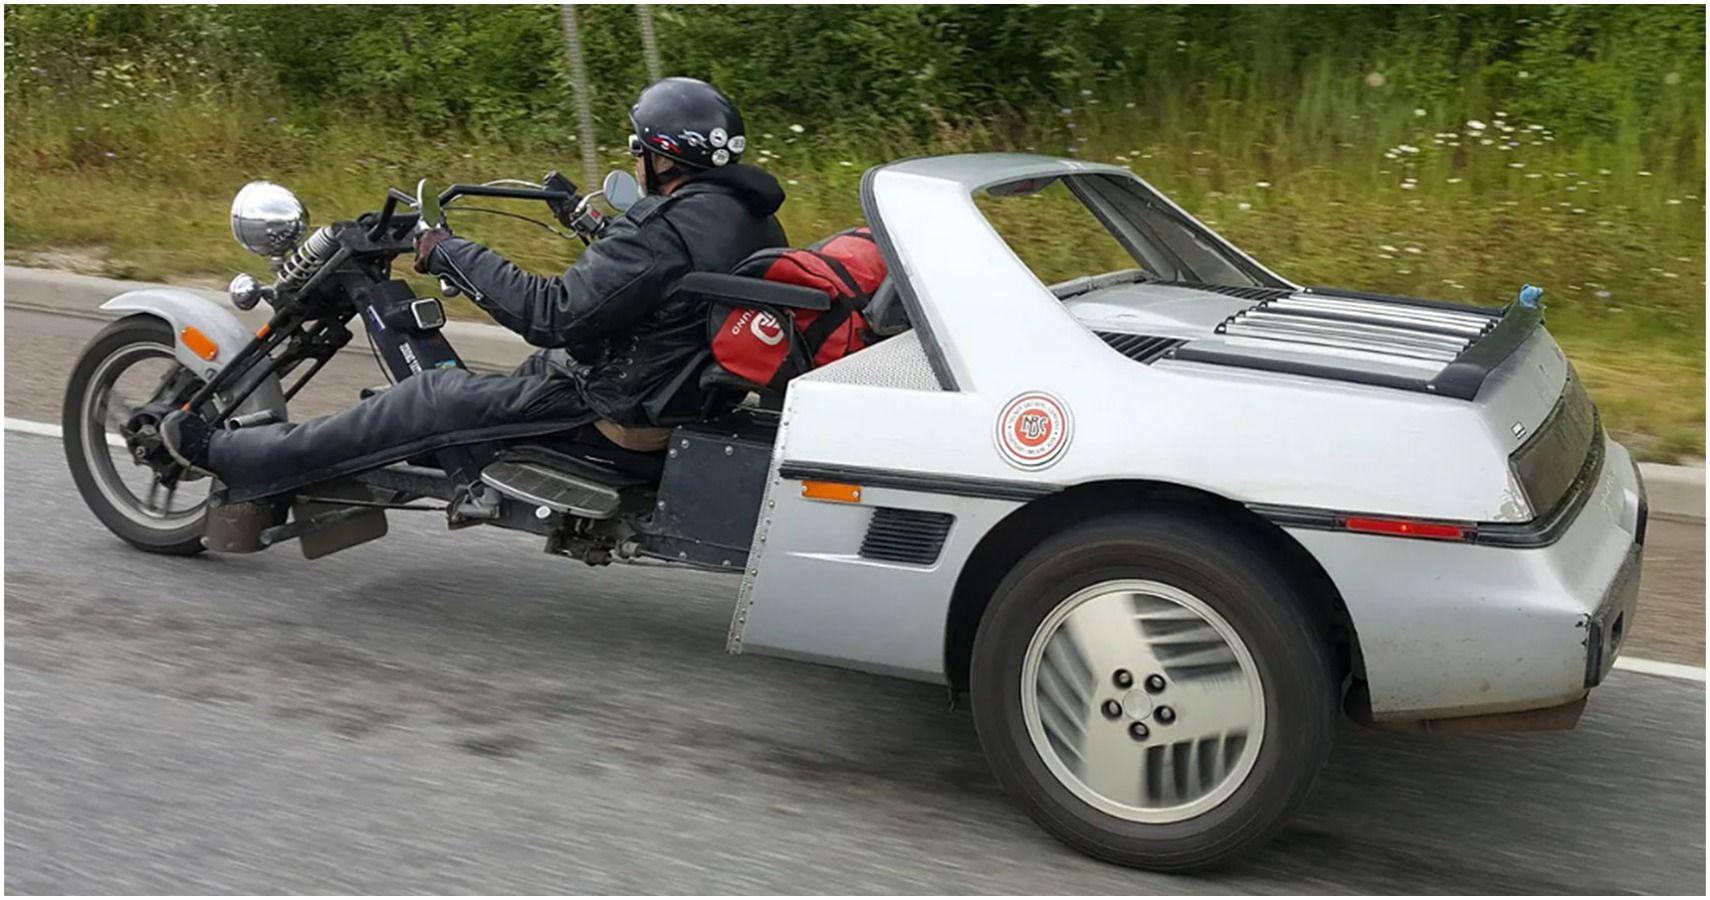 15 Motorcycle Modifications That Make No Sense